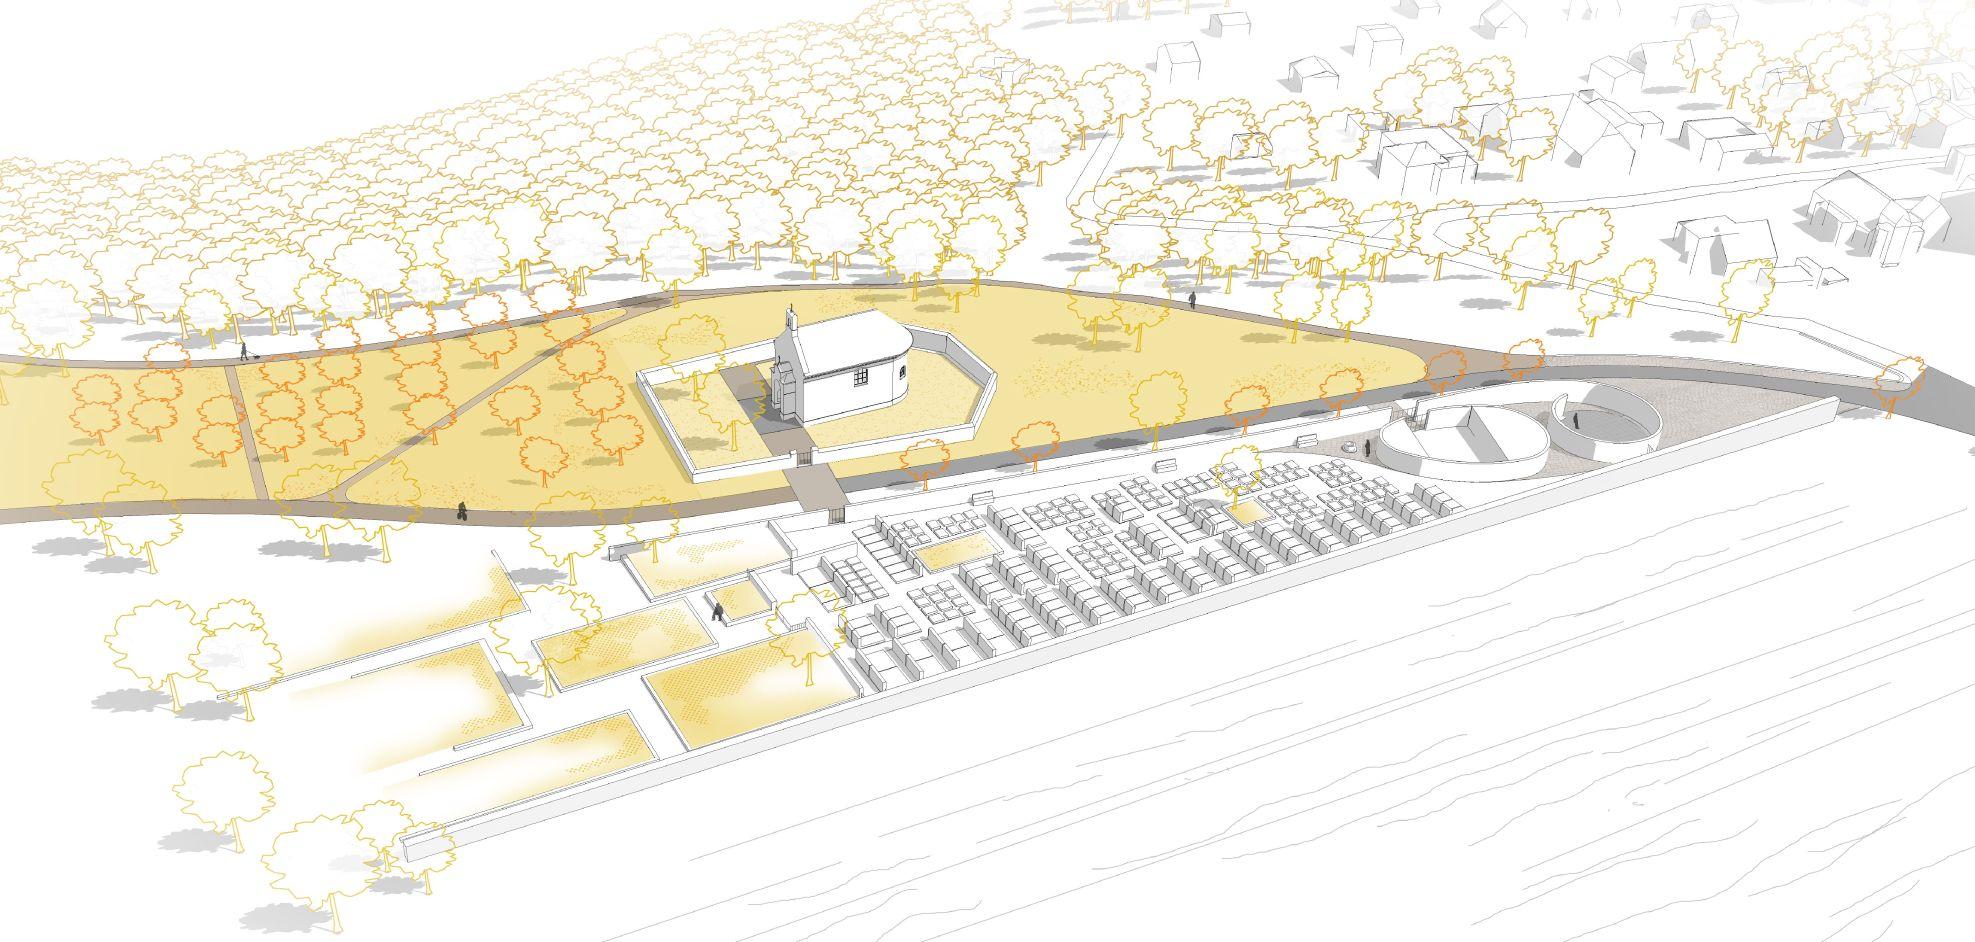 hřbitov-návrh 3 nadhled